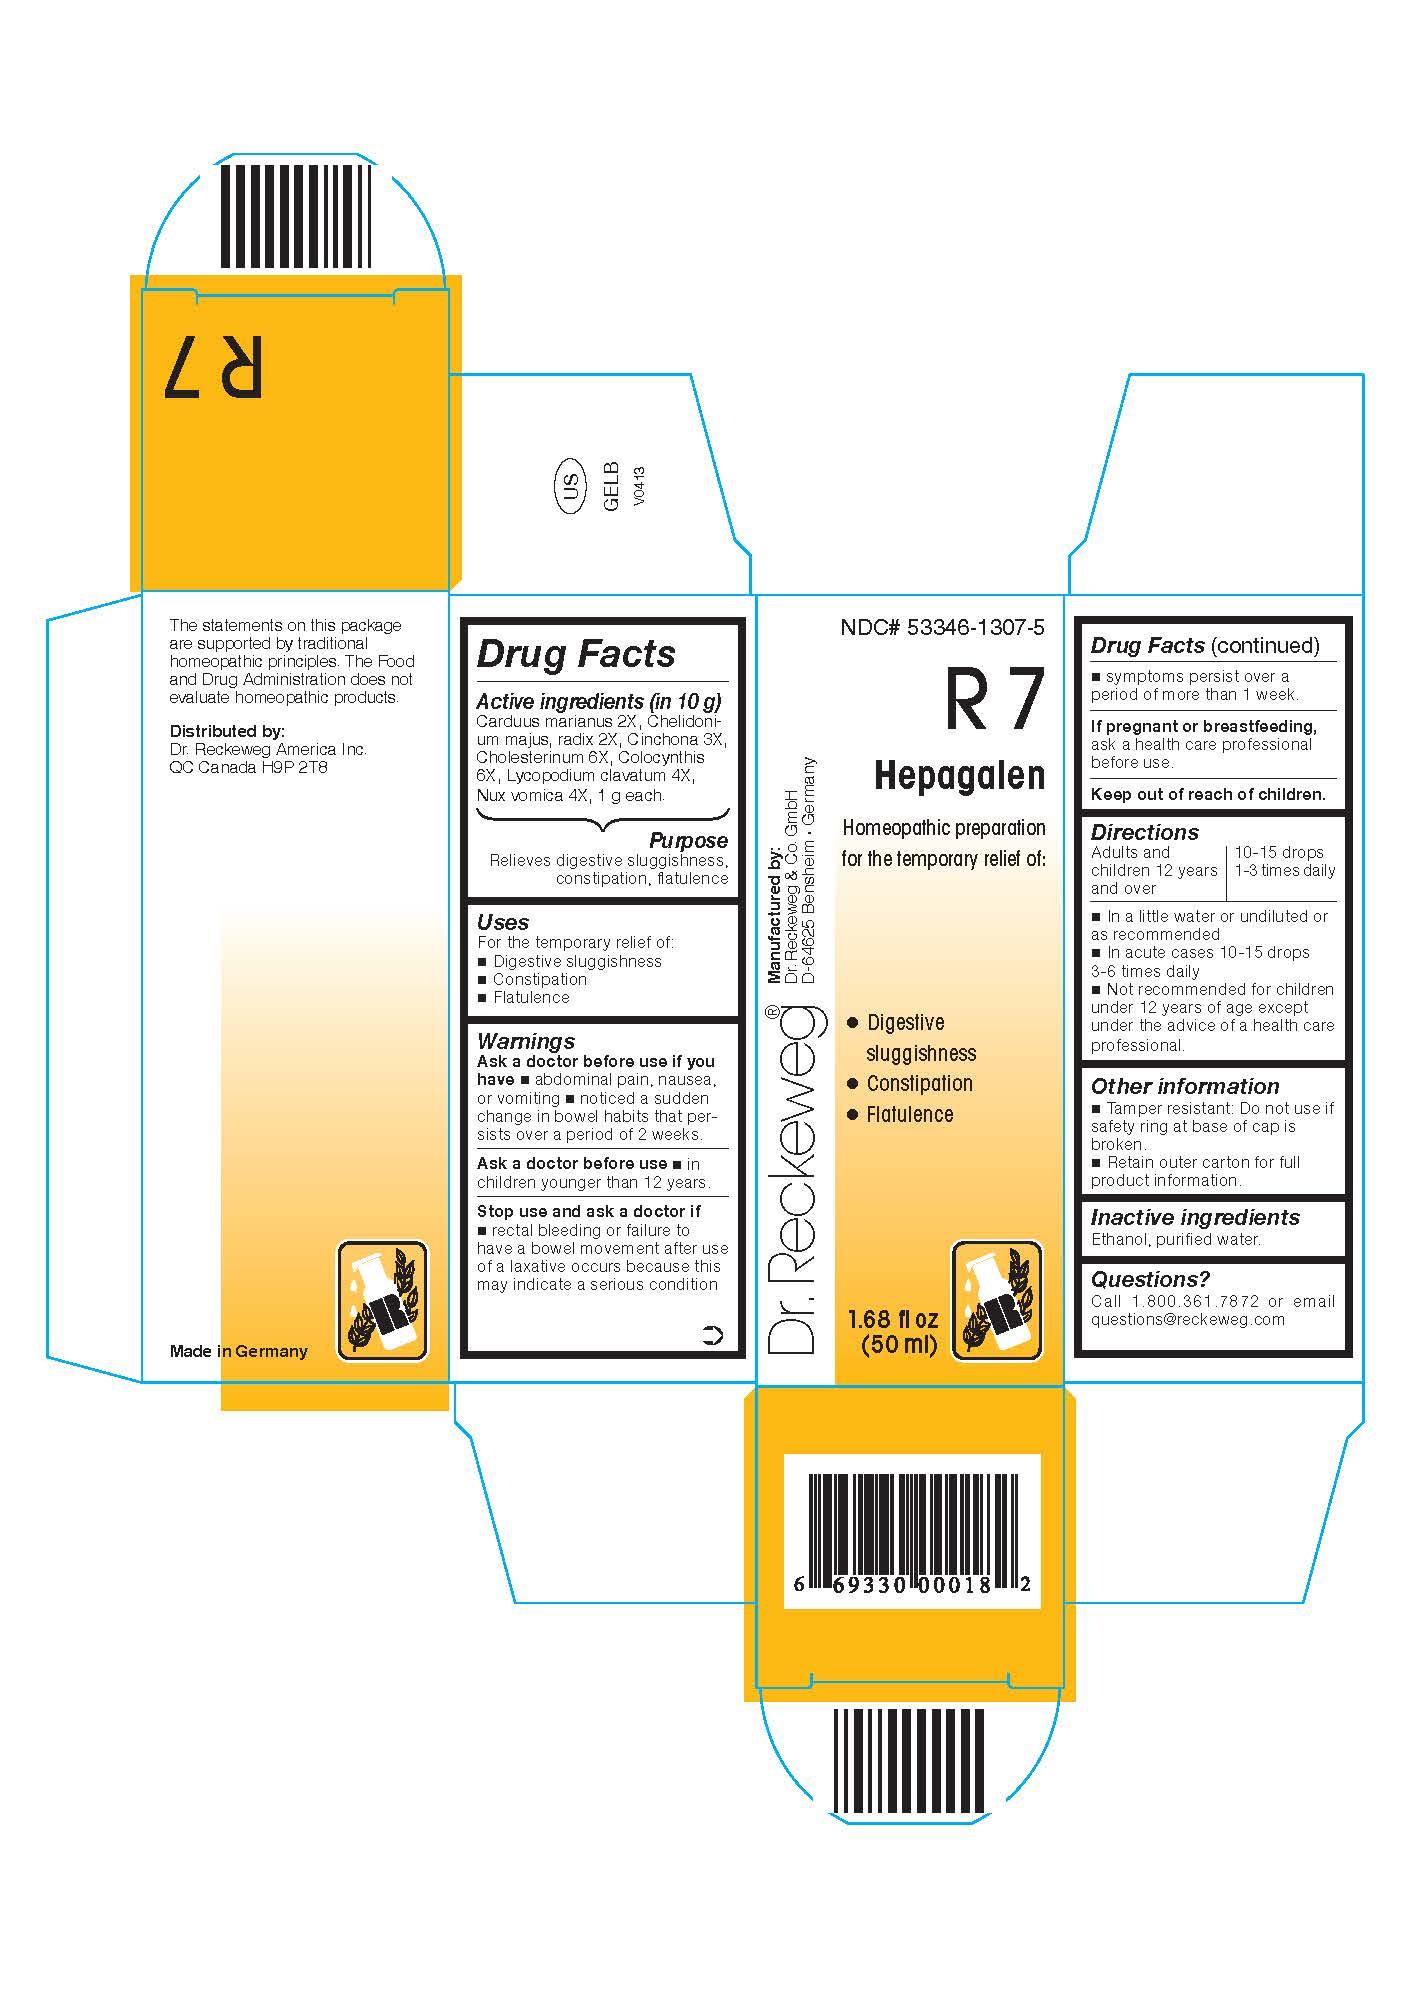 Dr. Reckeweg R7 Hepagalen Combination Product (Carduus Marianus 2x, Chelidonium Majus, Radix 2x, Cinchona 3x, Cholesterinum 6x, Colocynthis 6x, Lycopodium Clavatum 4x, Nux Vomica 4x) Liquid [Pharmazeutische Fabrik Dr. Reckeweg & Co]